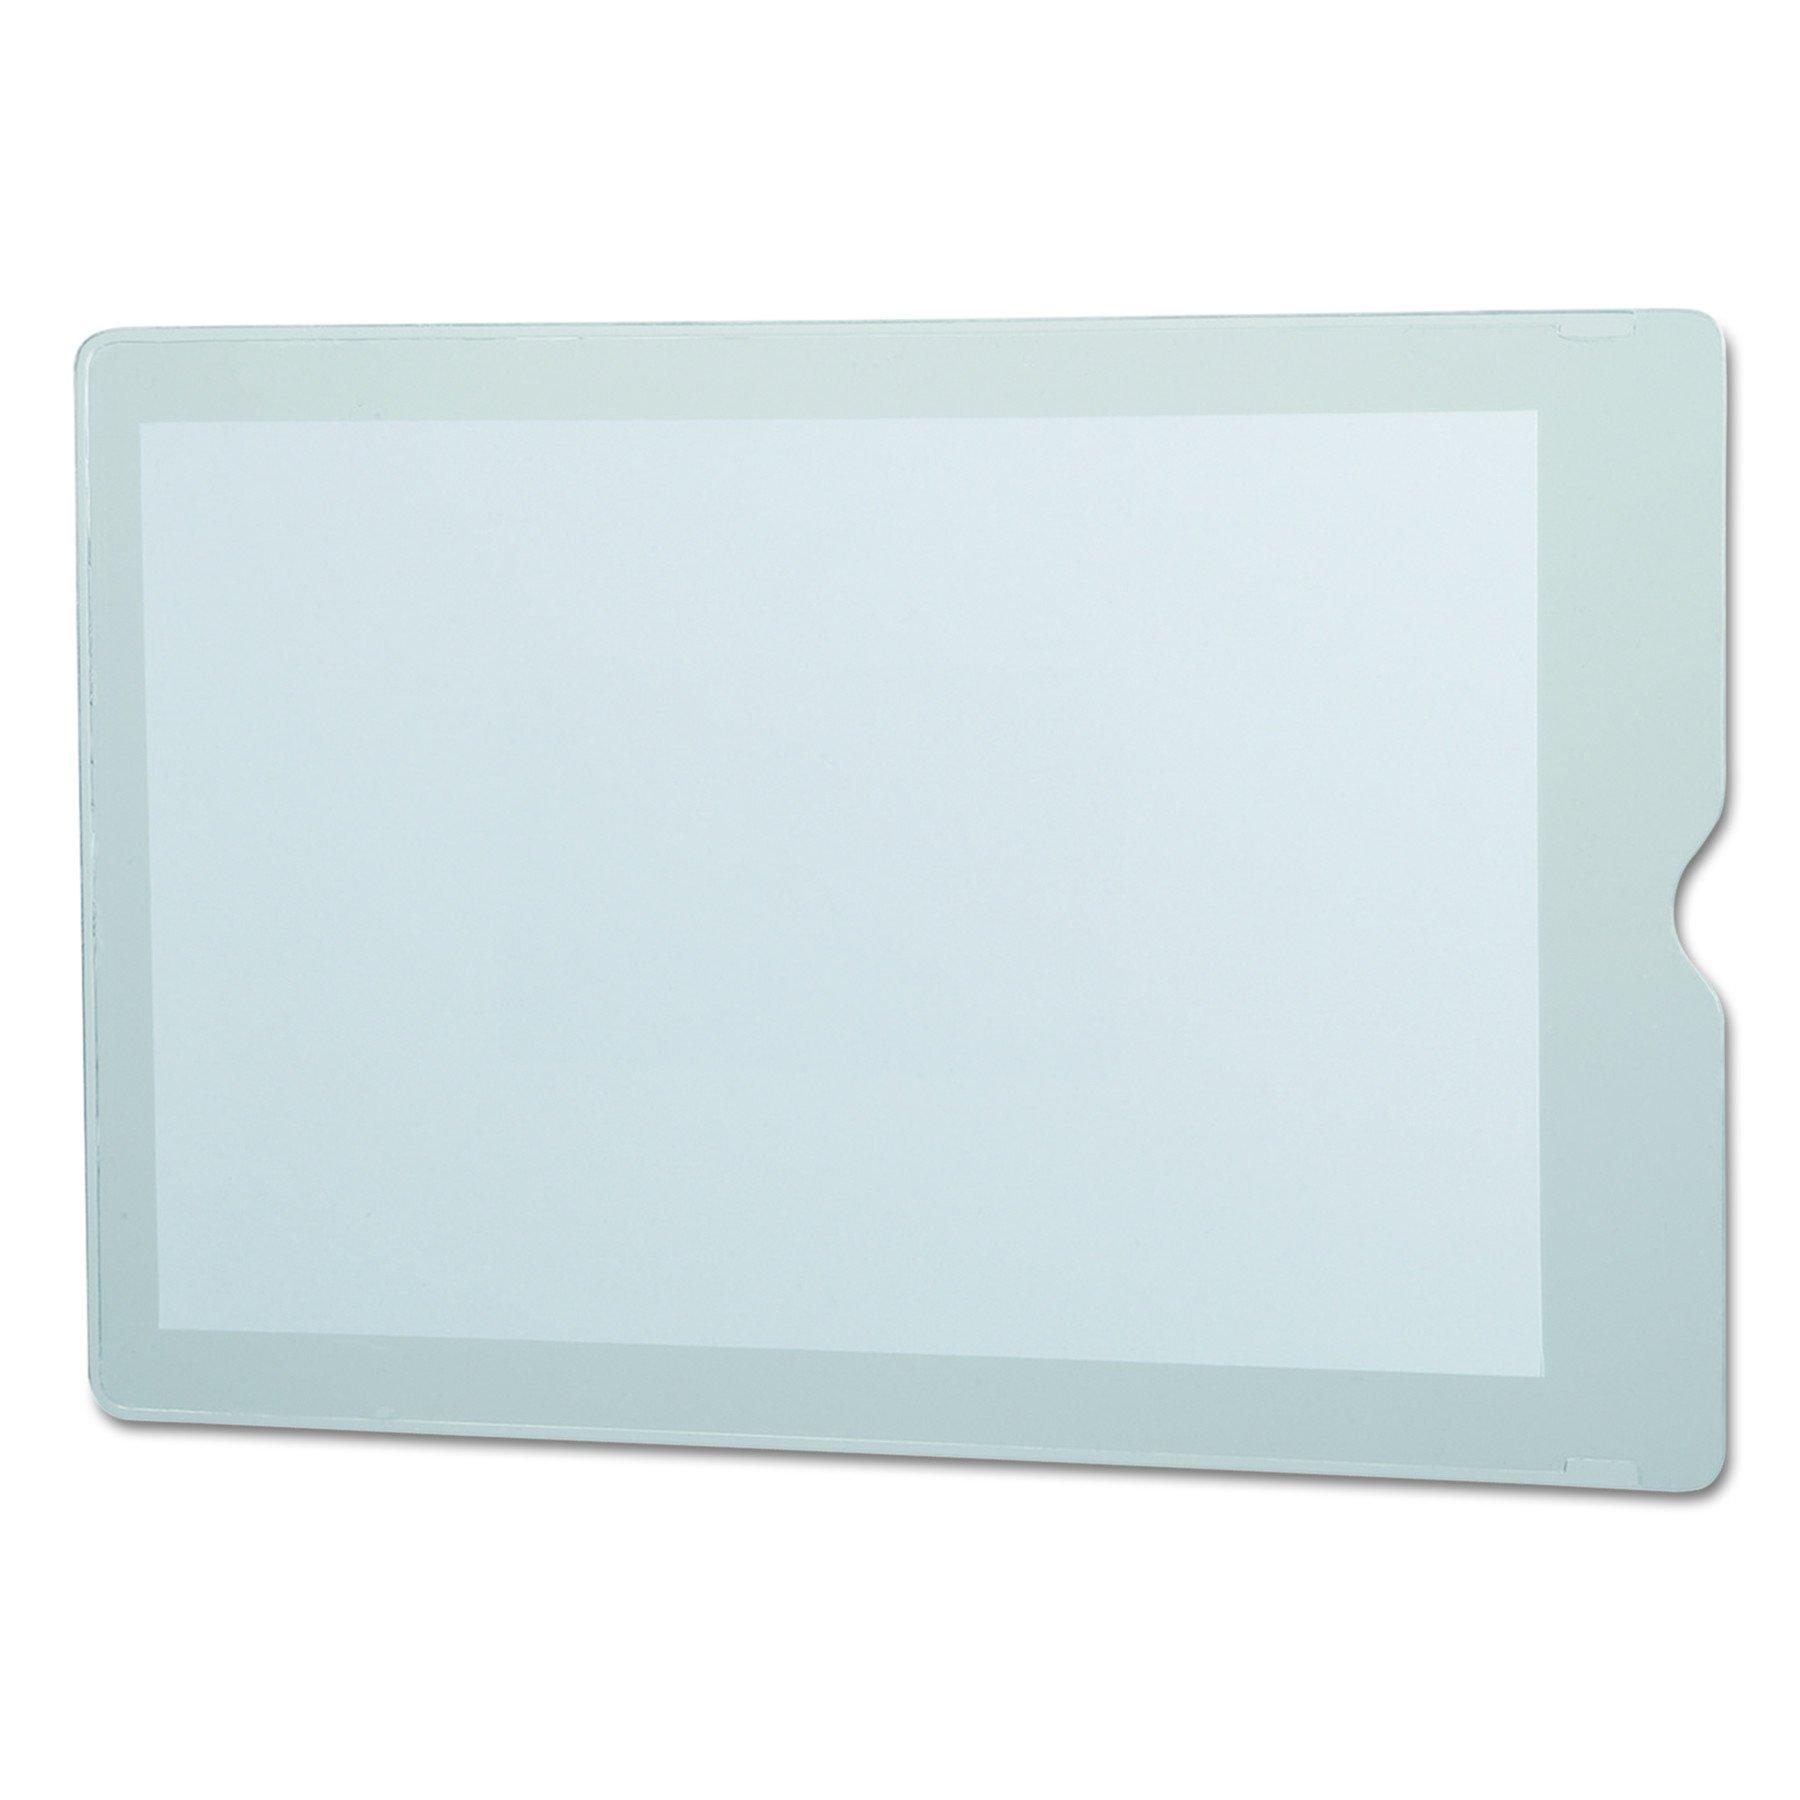 Oxford 65008 Utili-Jac Heavy-Duty Clear Plastic Envelopes, 5 x 8 (Box of 50)